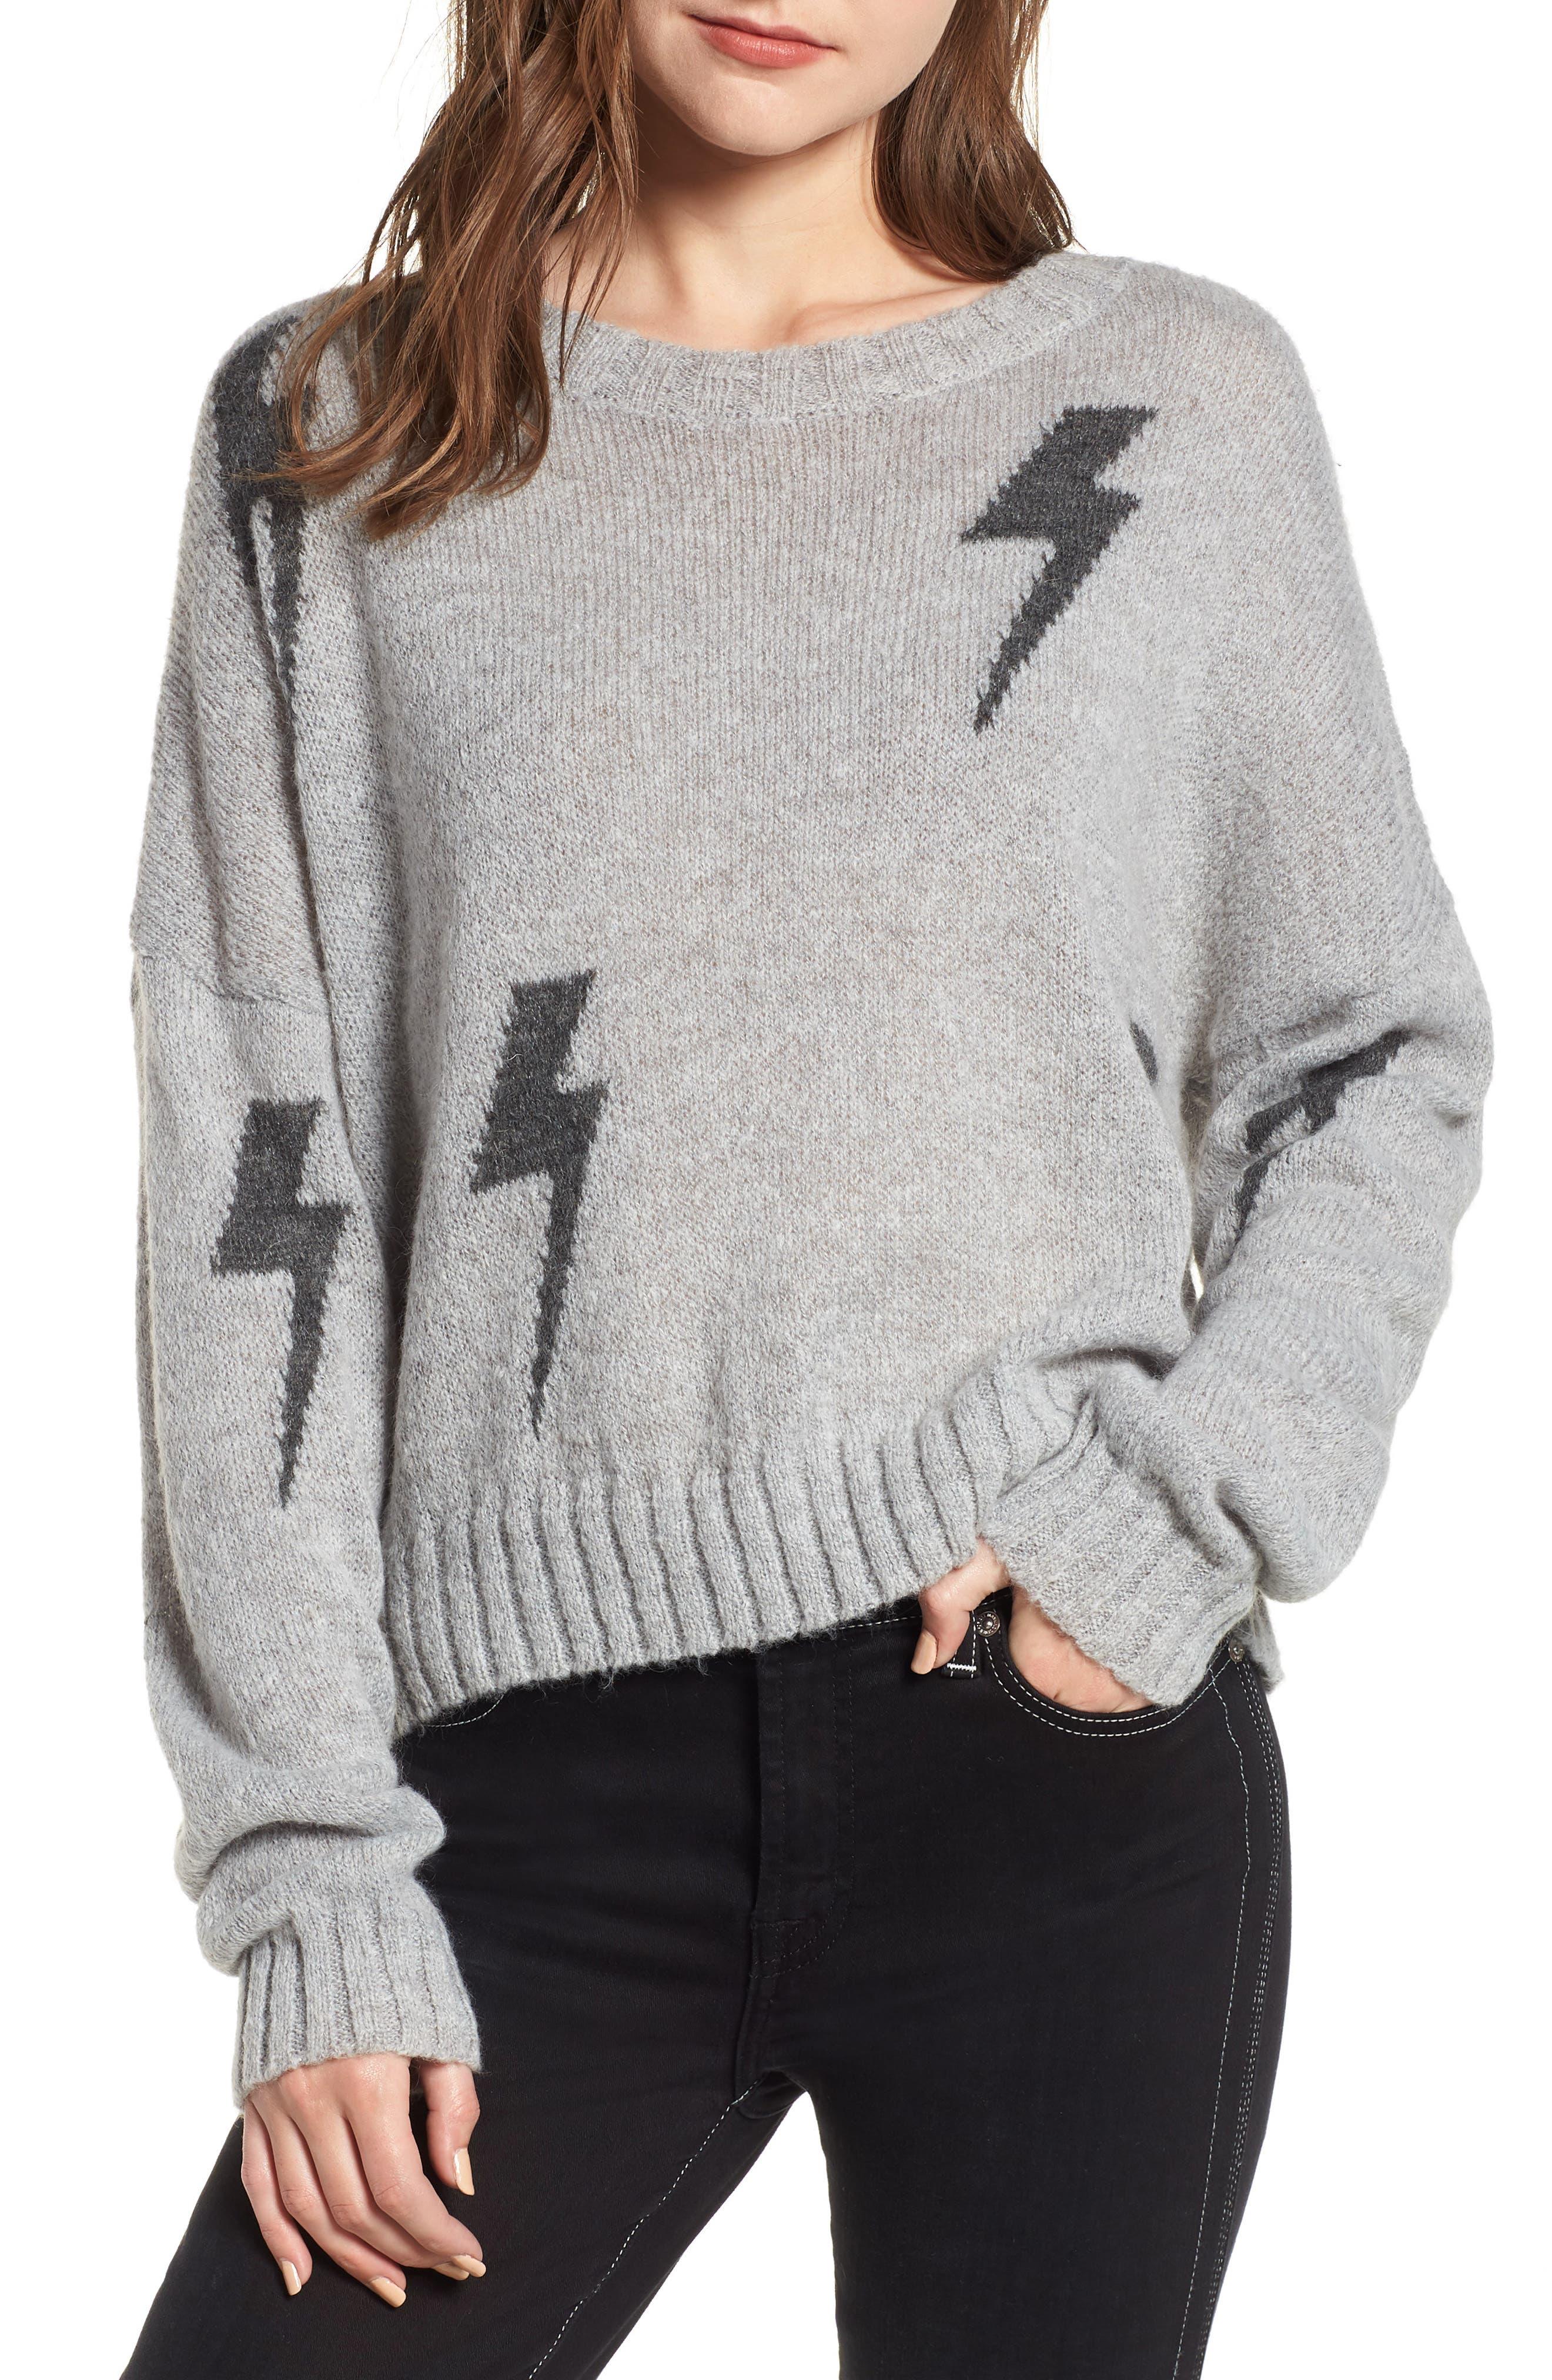 Perci Sweater,                             Main thumbnail 1, color,                             GREY/CHARCOAL LIGHTNING